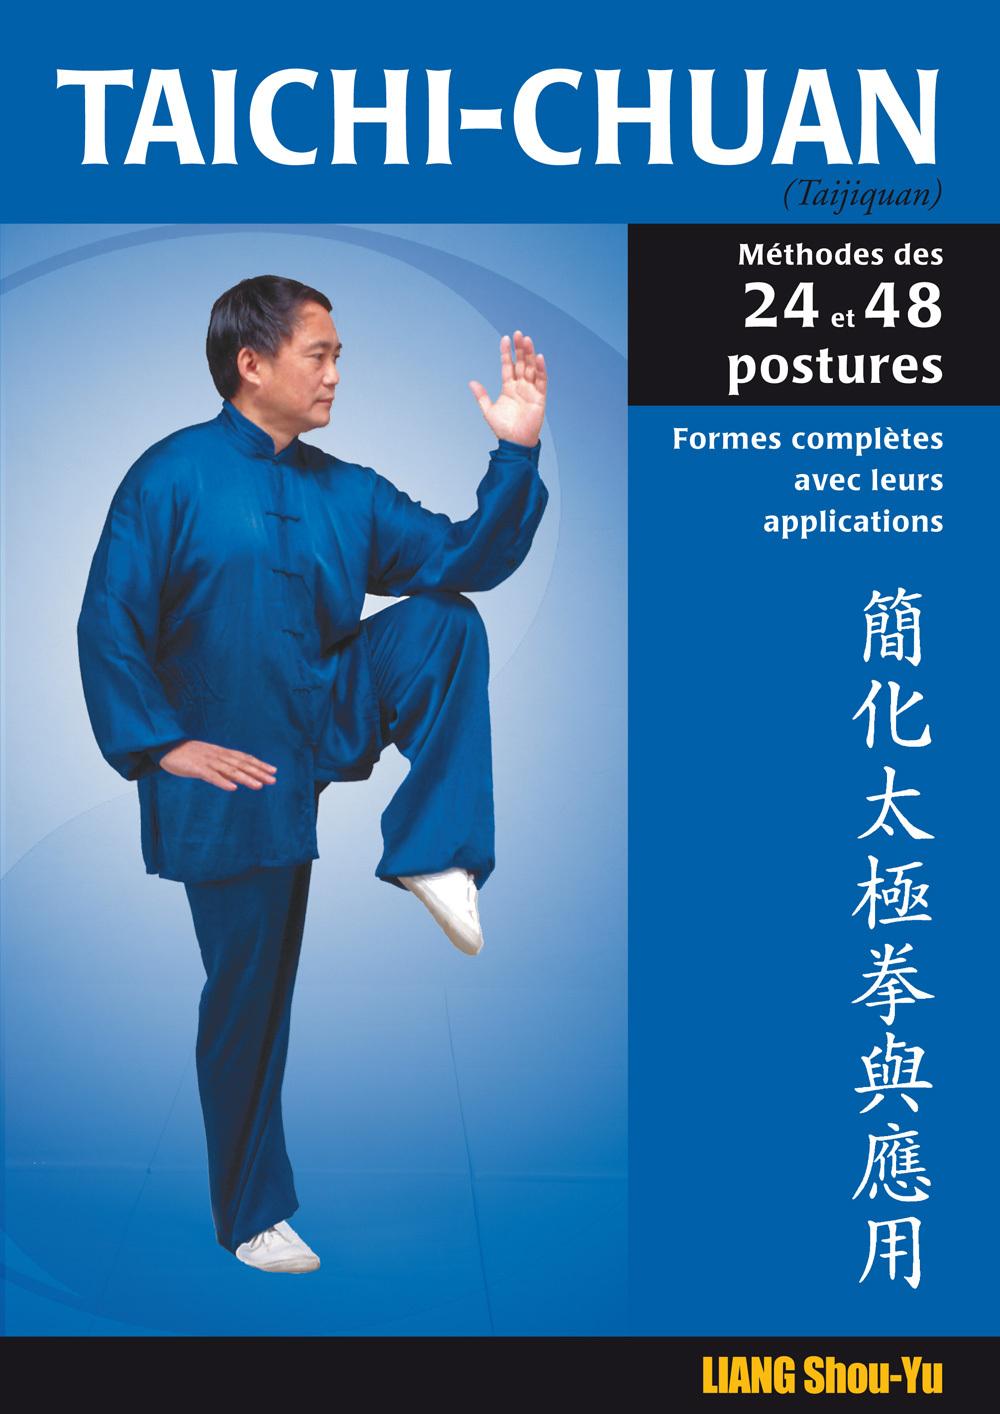 TAICHI-CHUAN SIMPLIFIE : 24 ET 48 POSTURES